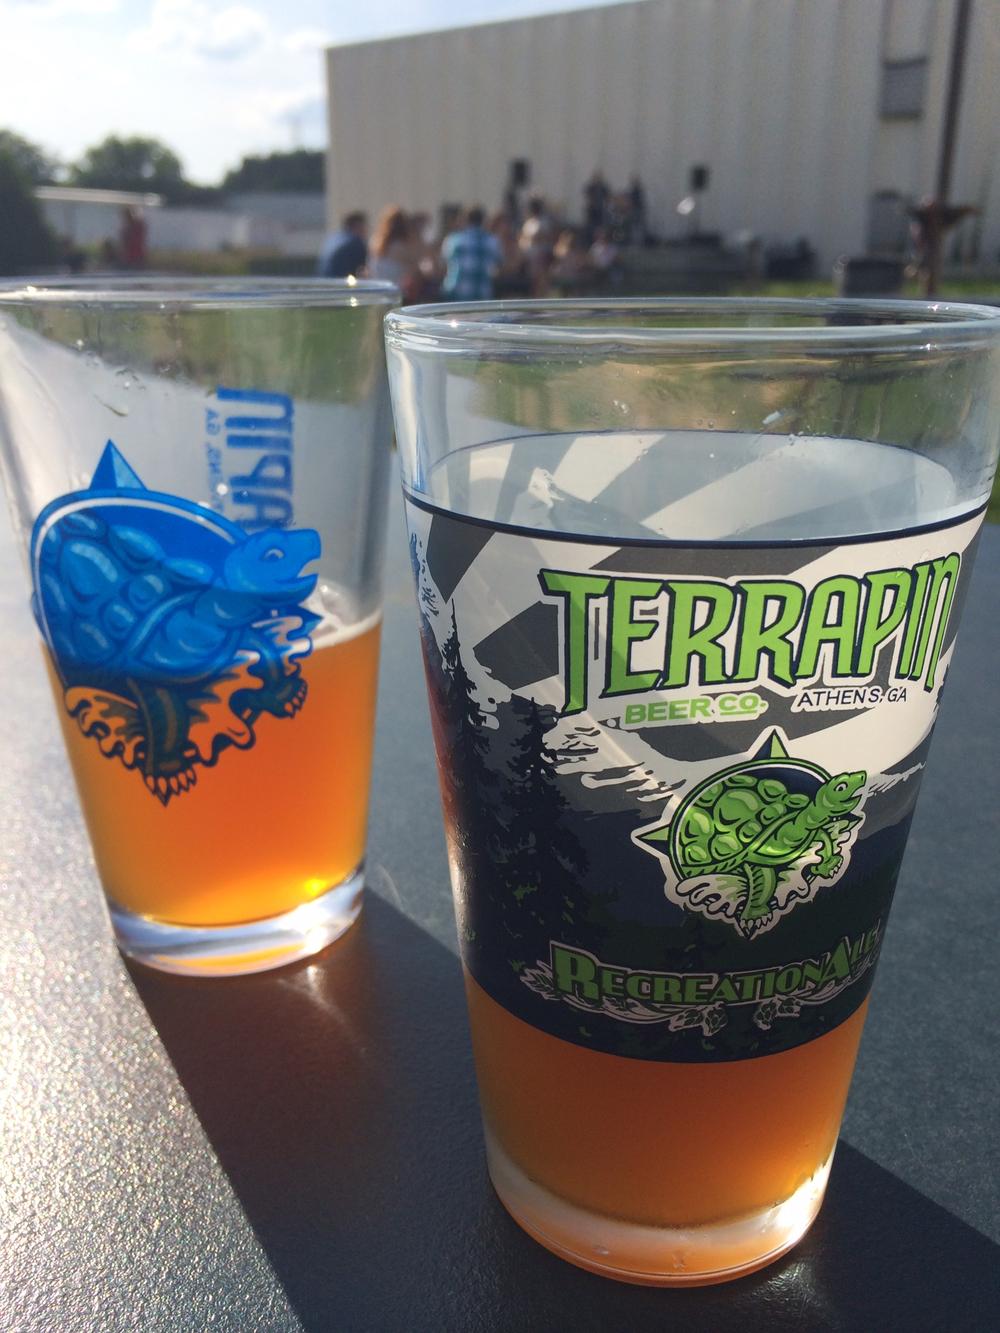 Terrapin Brewery Athens Georgia